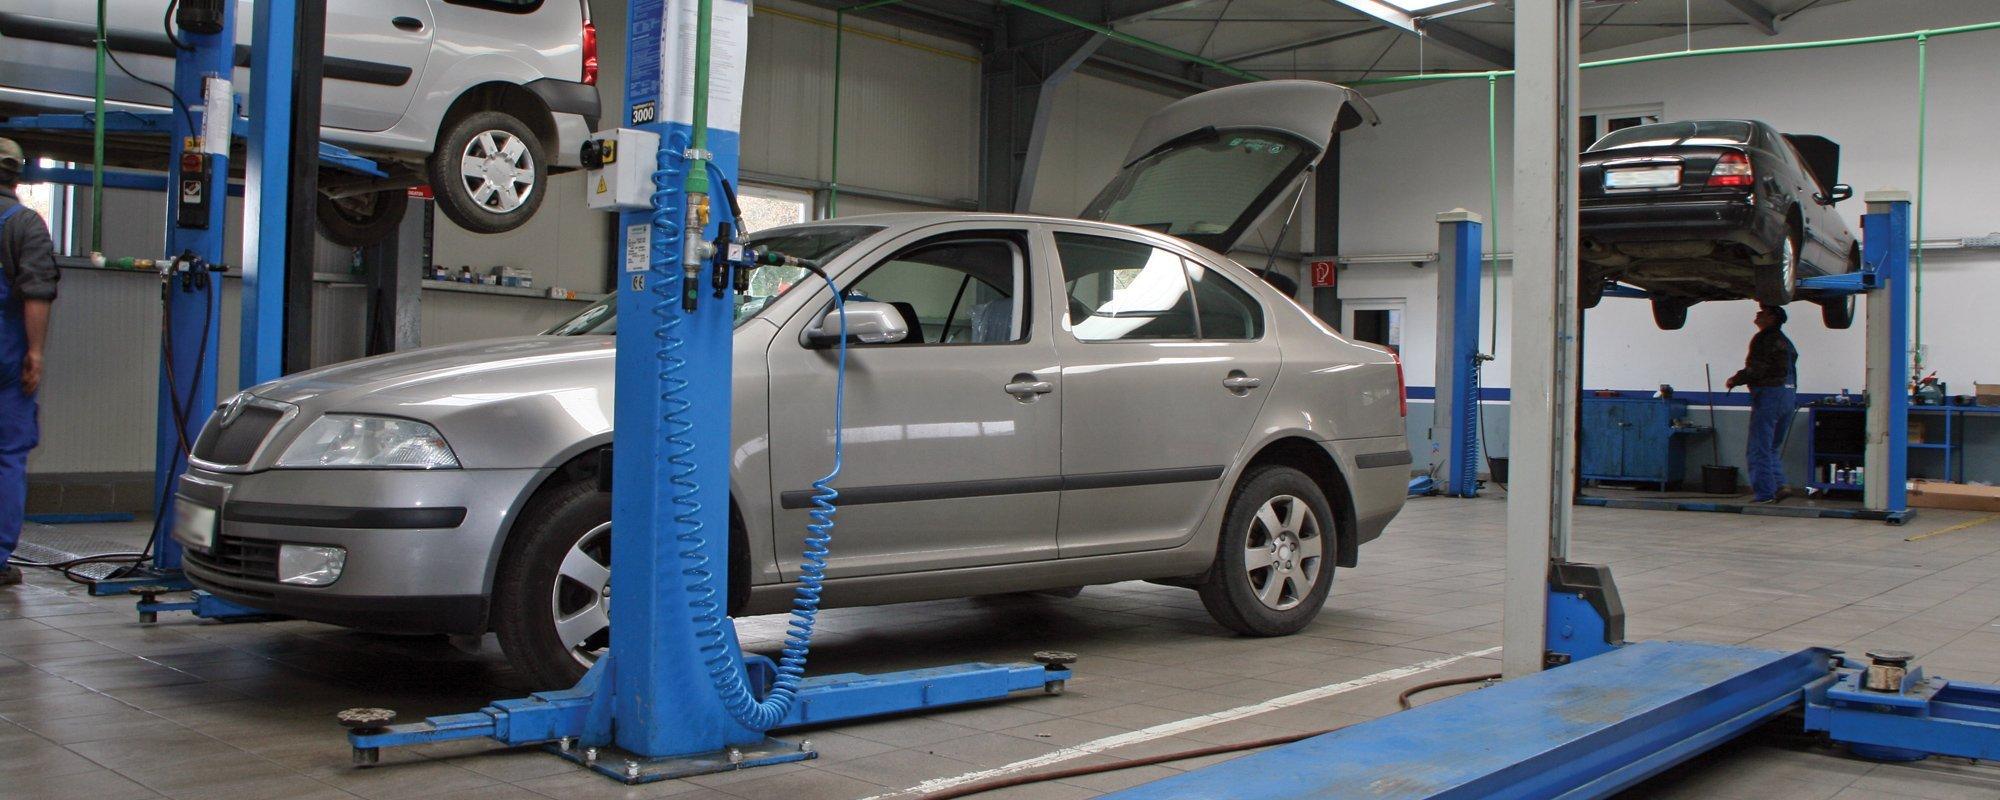 Car being repaired at the repair shop